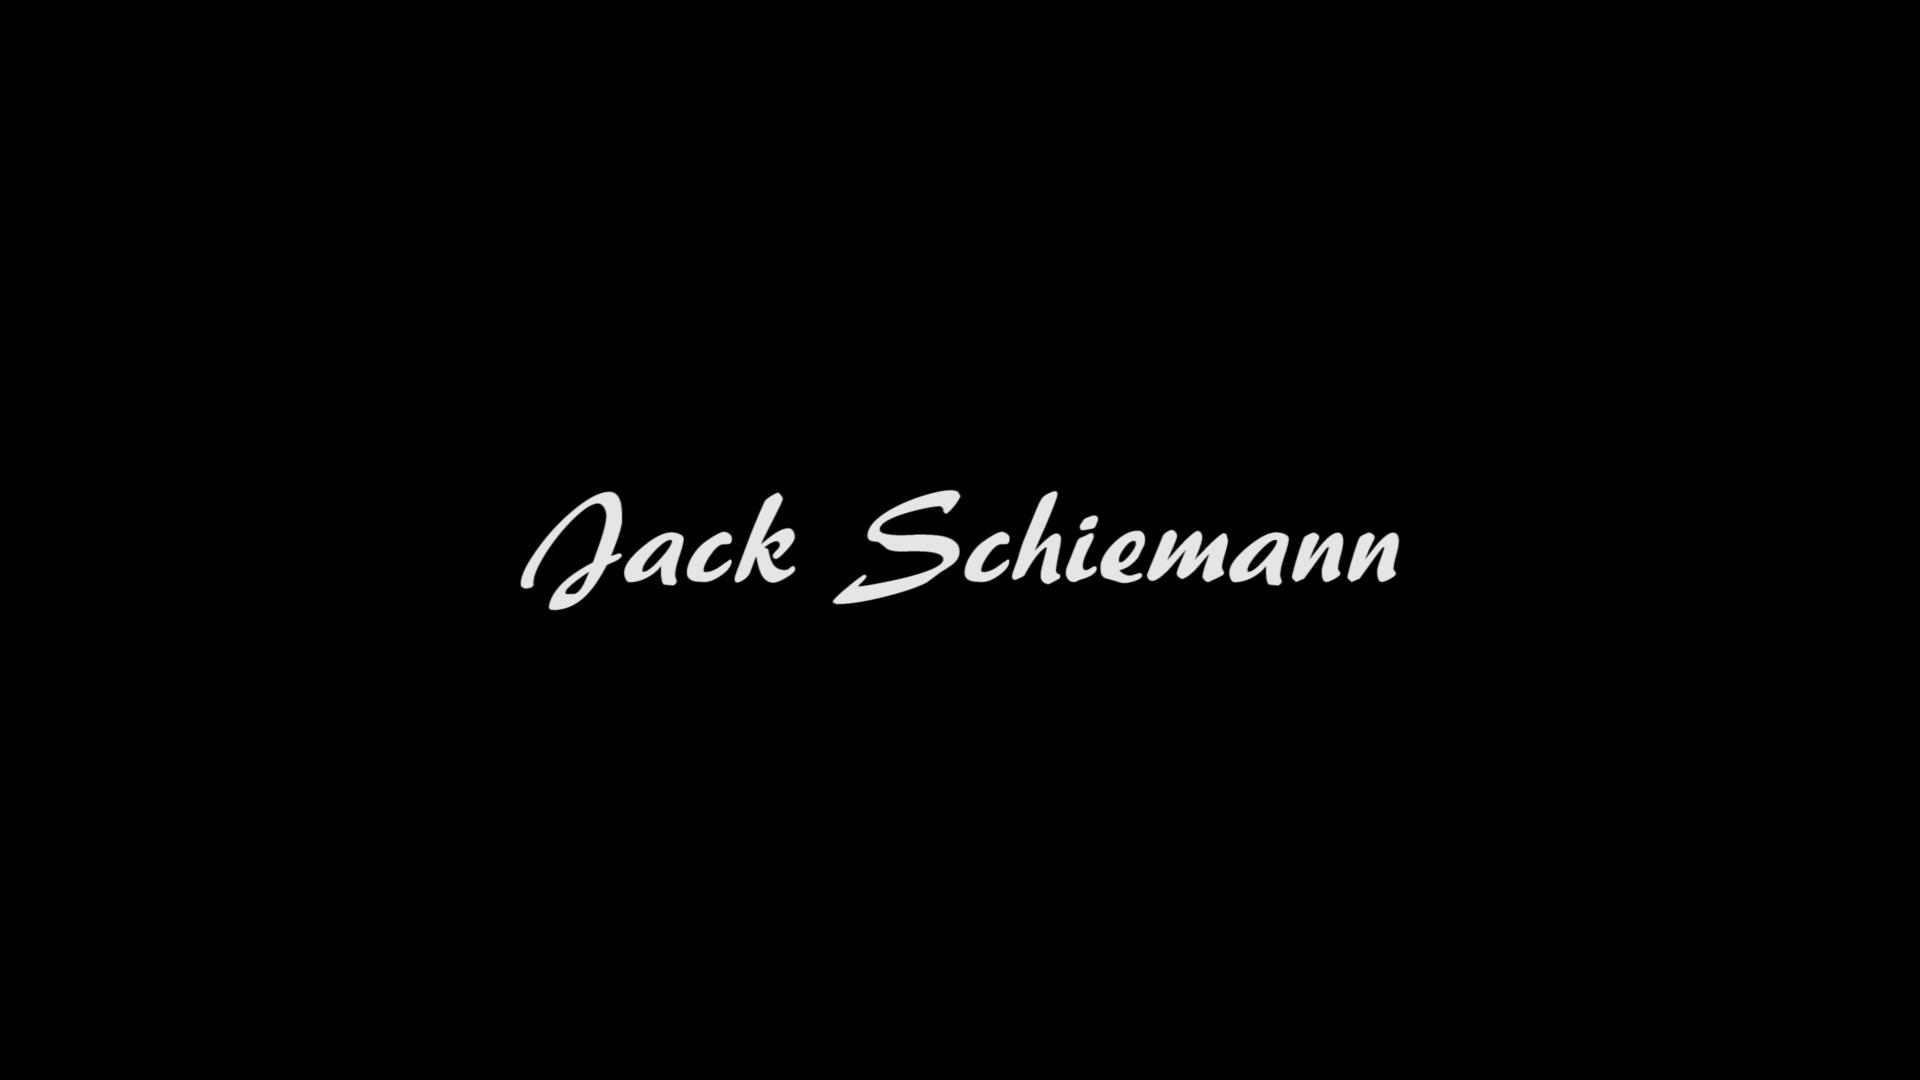 jack Schiemann's Signature